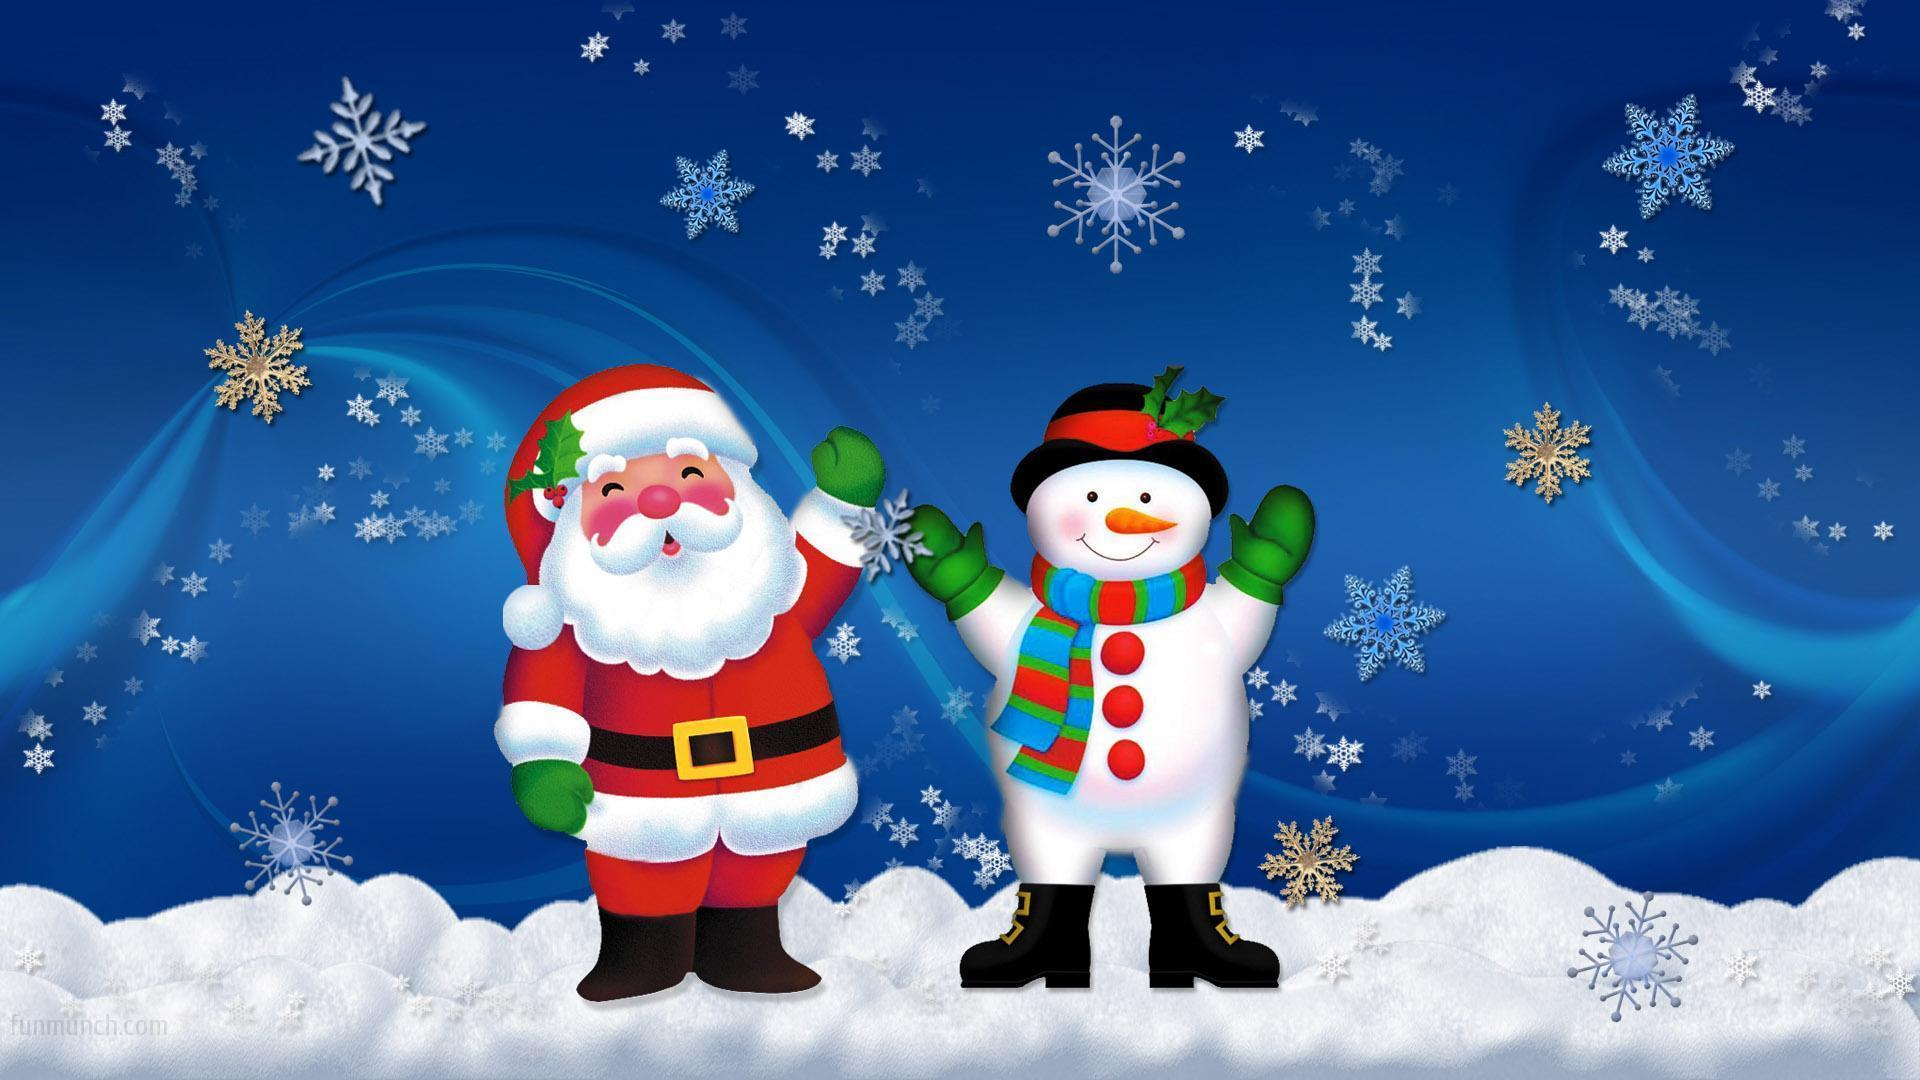 Christmas  FreeChristmasWallpapersnet